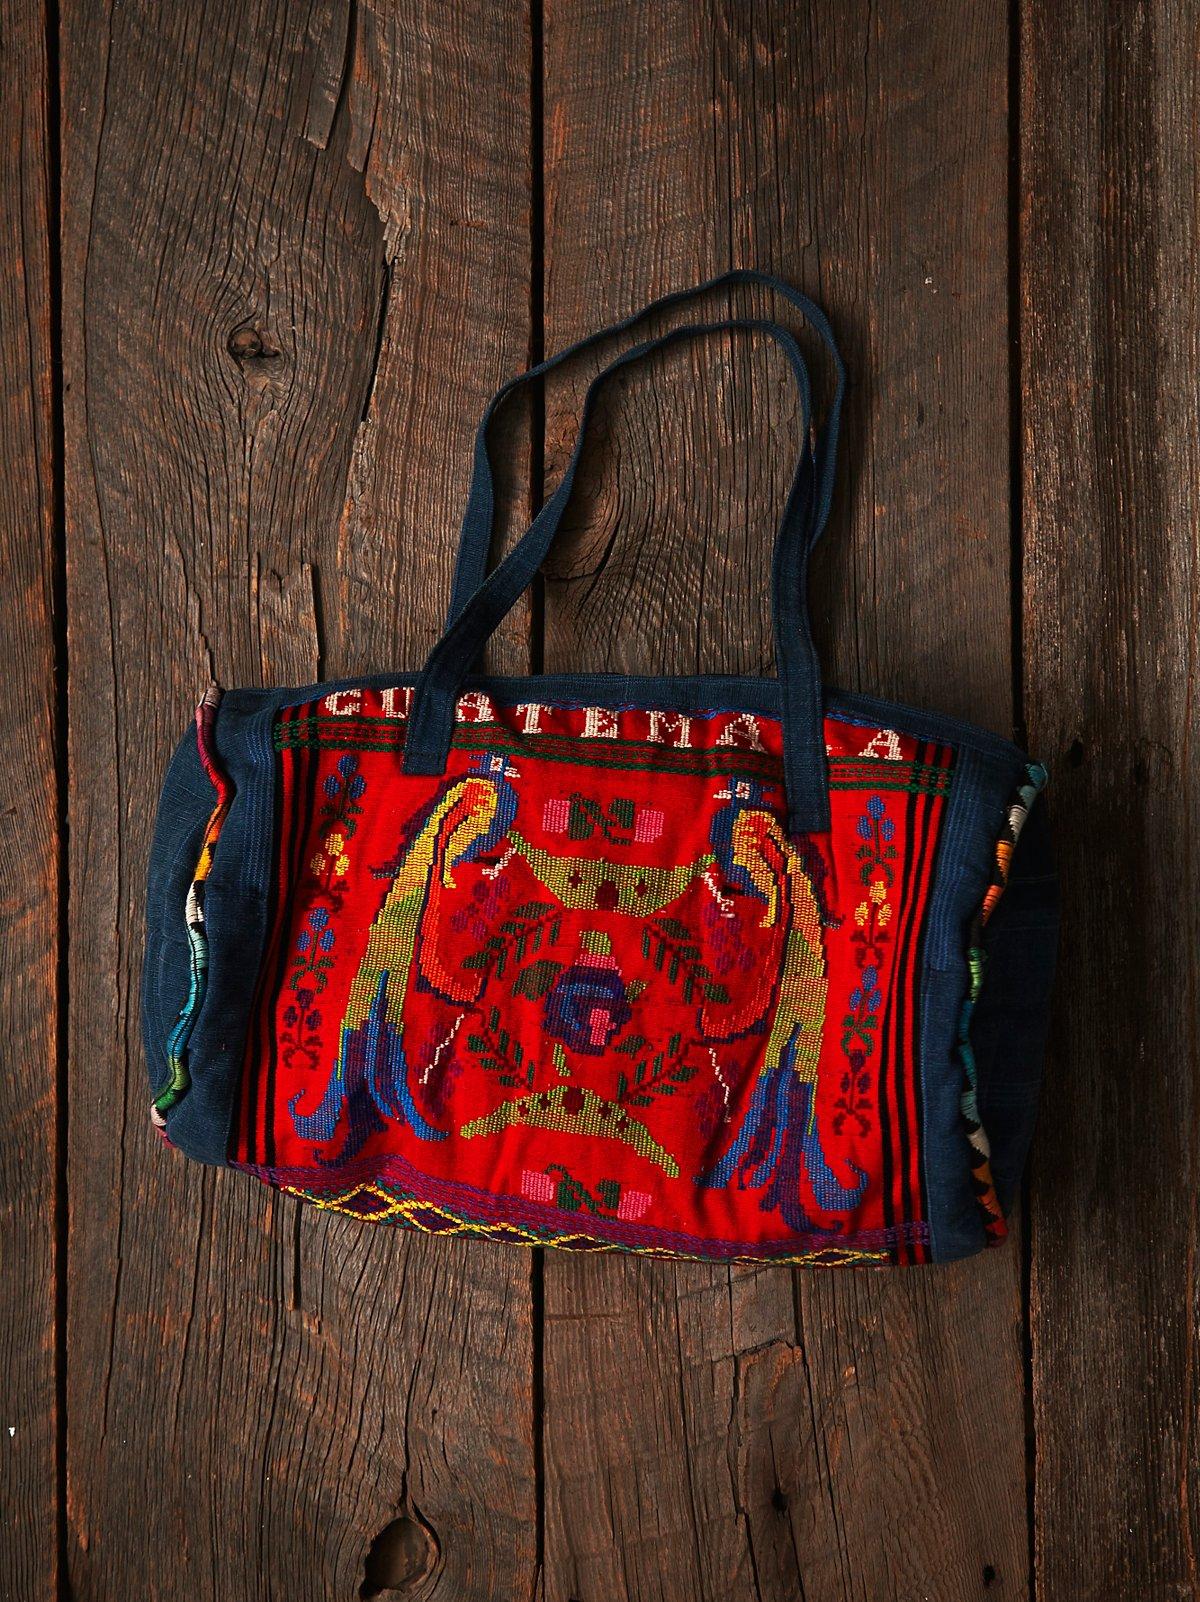 Vintage Embroidered Denim Duffle